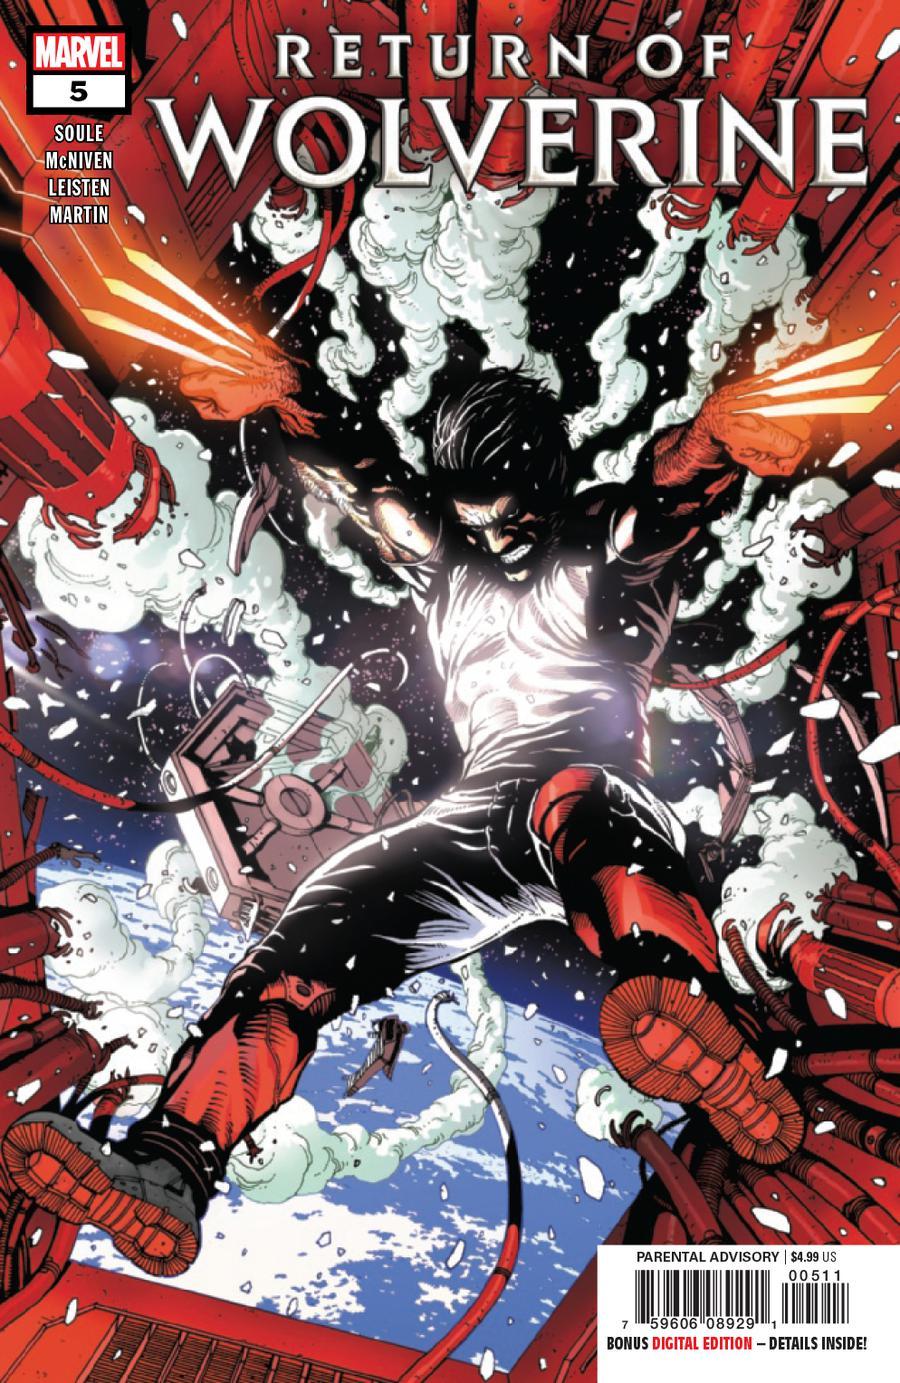 Return Of Wolverine #5 Cover A Regular Steve McNiven Cover